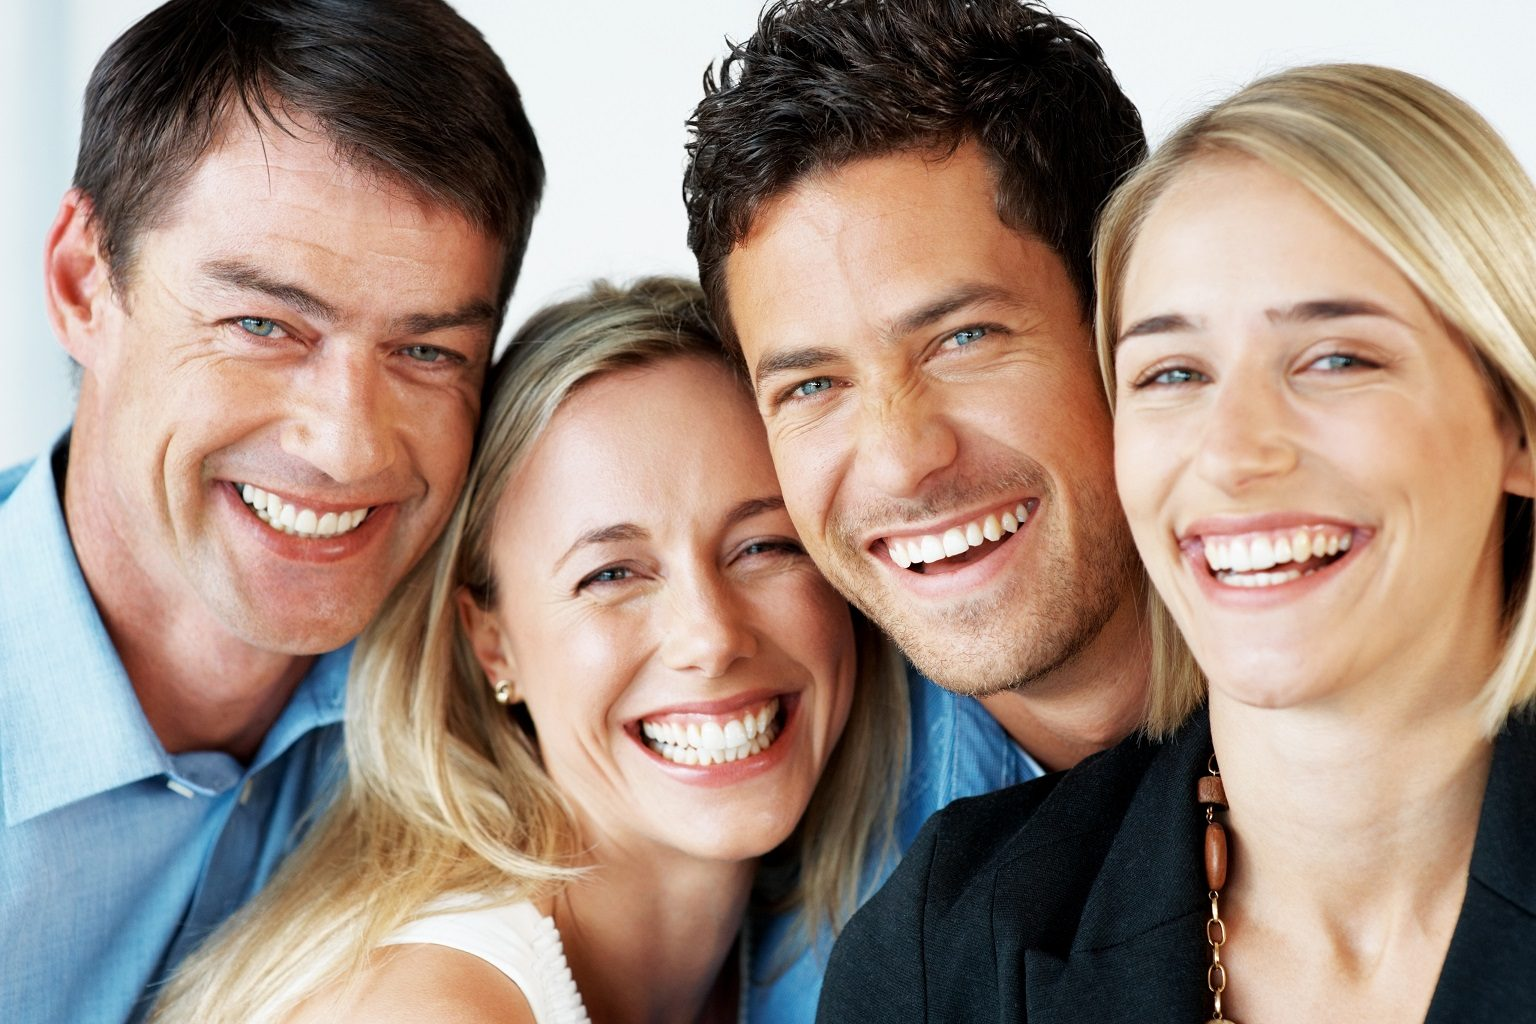 parecer más joven, dentista majadahonda, clínica dental majadahonda, odontólogo majadahonda, odontología majadahonda, revisión dental majadahonda, limpieza oral majadahonda, salud bucal majadahonda, sonrisa majadahonda